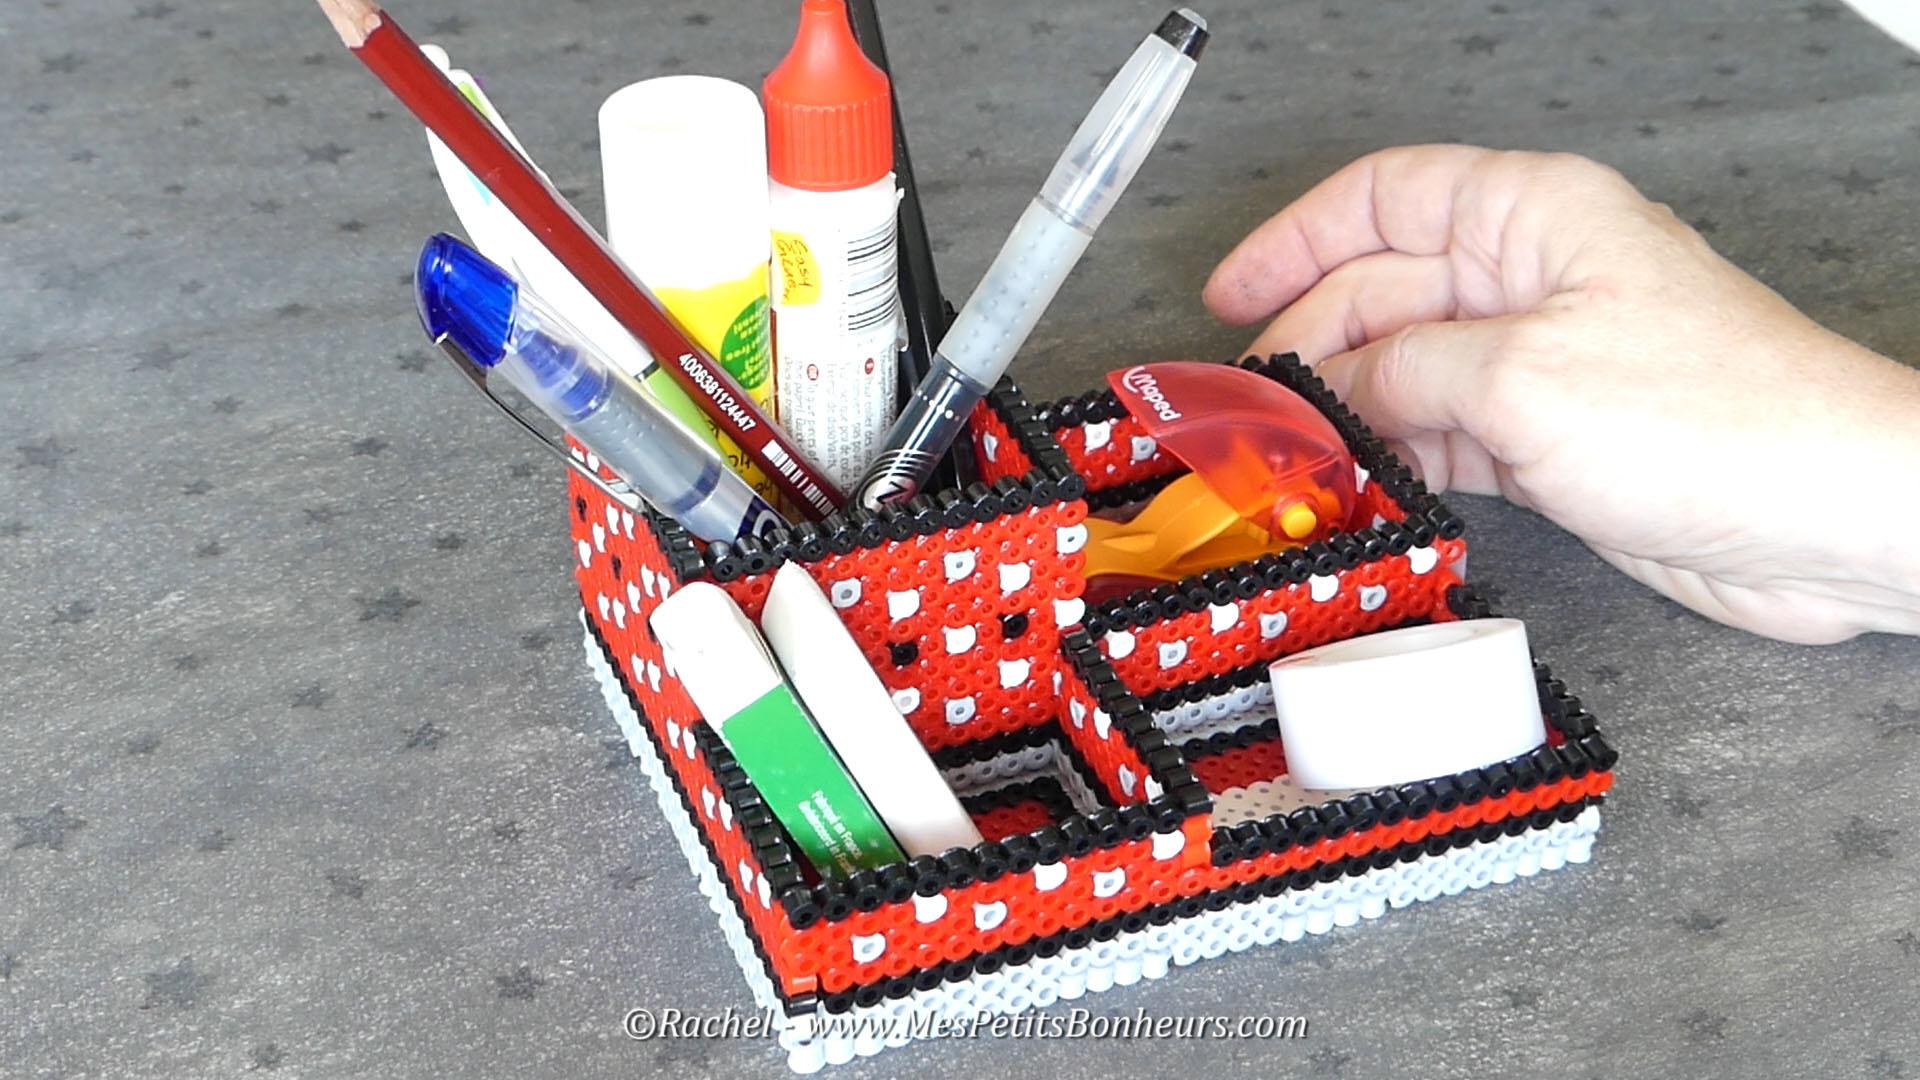 cadeau fete des peres a fabriquer perles hama 3d rangement bureau